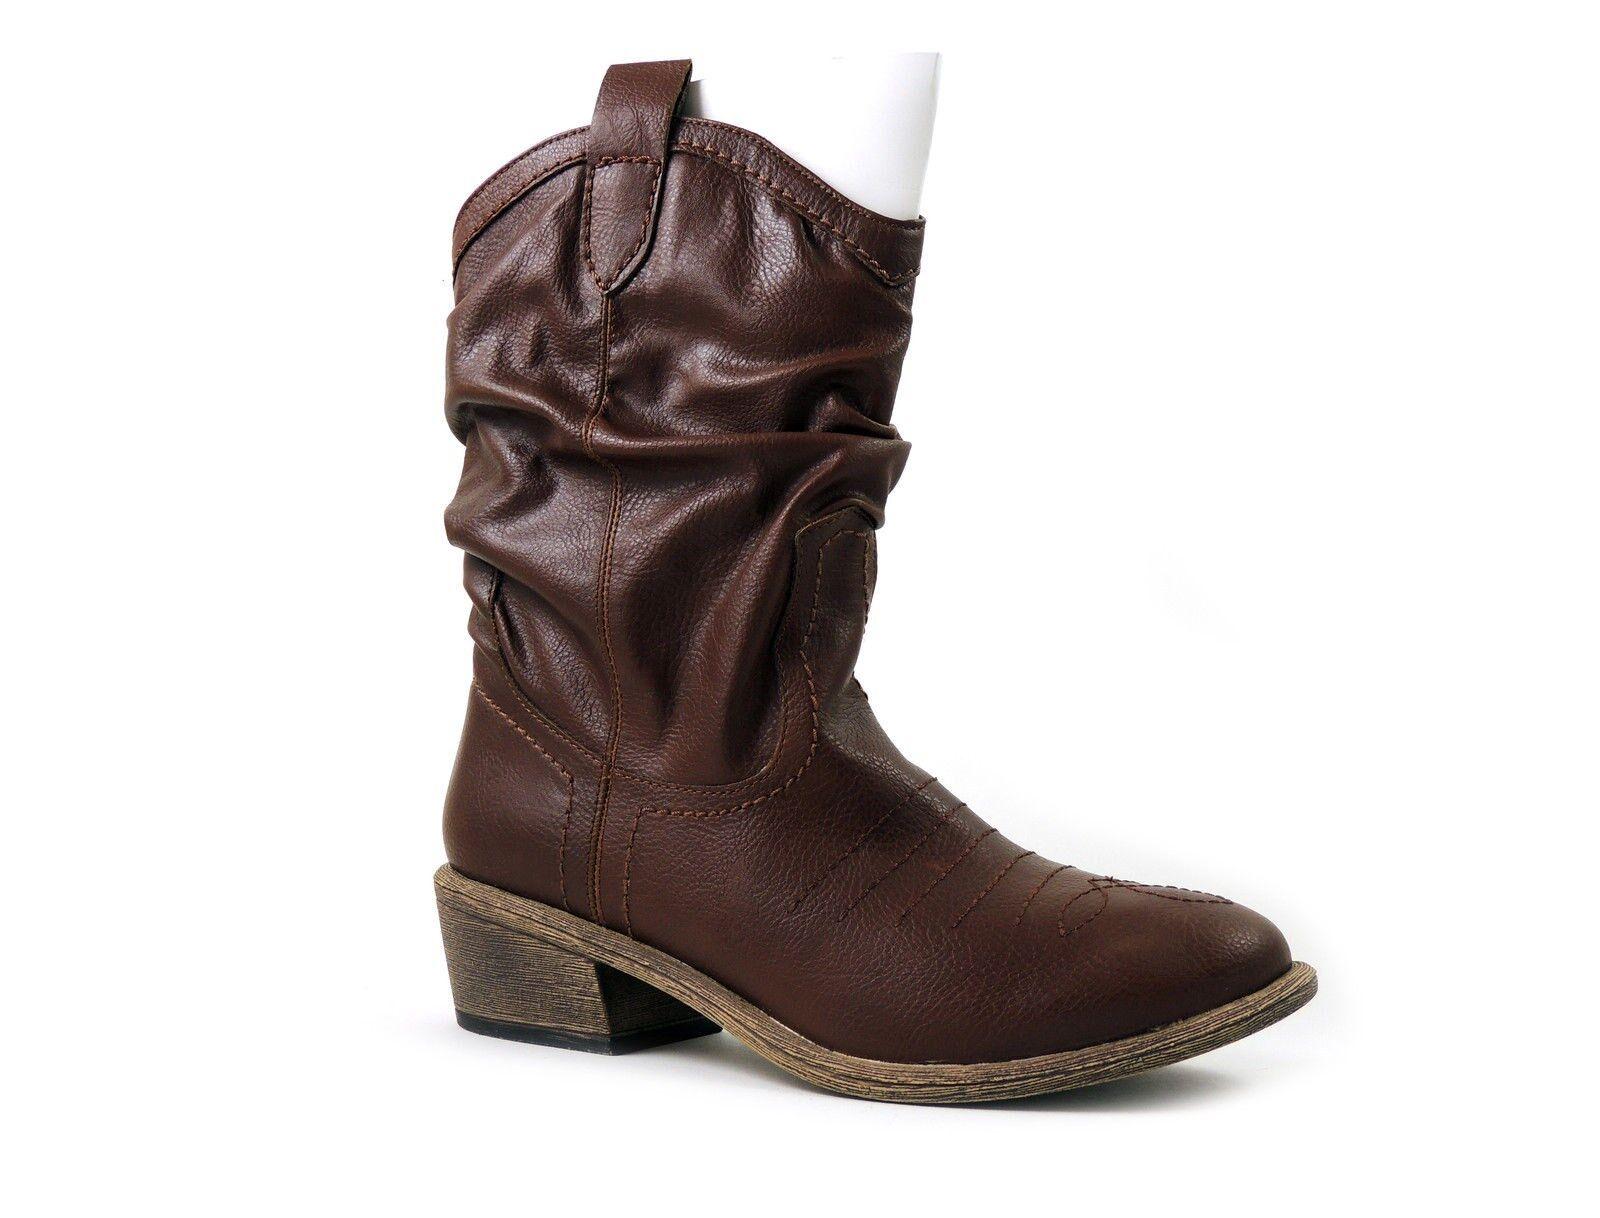 American Rag Women's Shoes, Coyote Cowboy Boots Distressed Oak Brown Sz 6.5 M